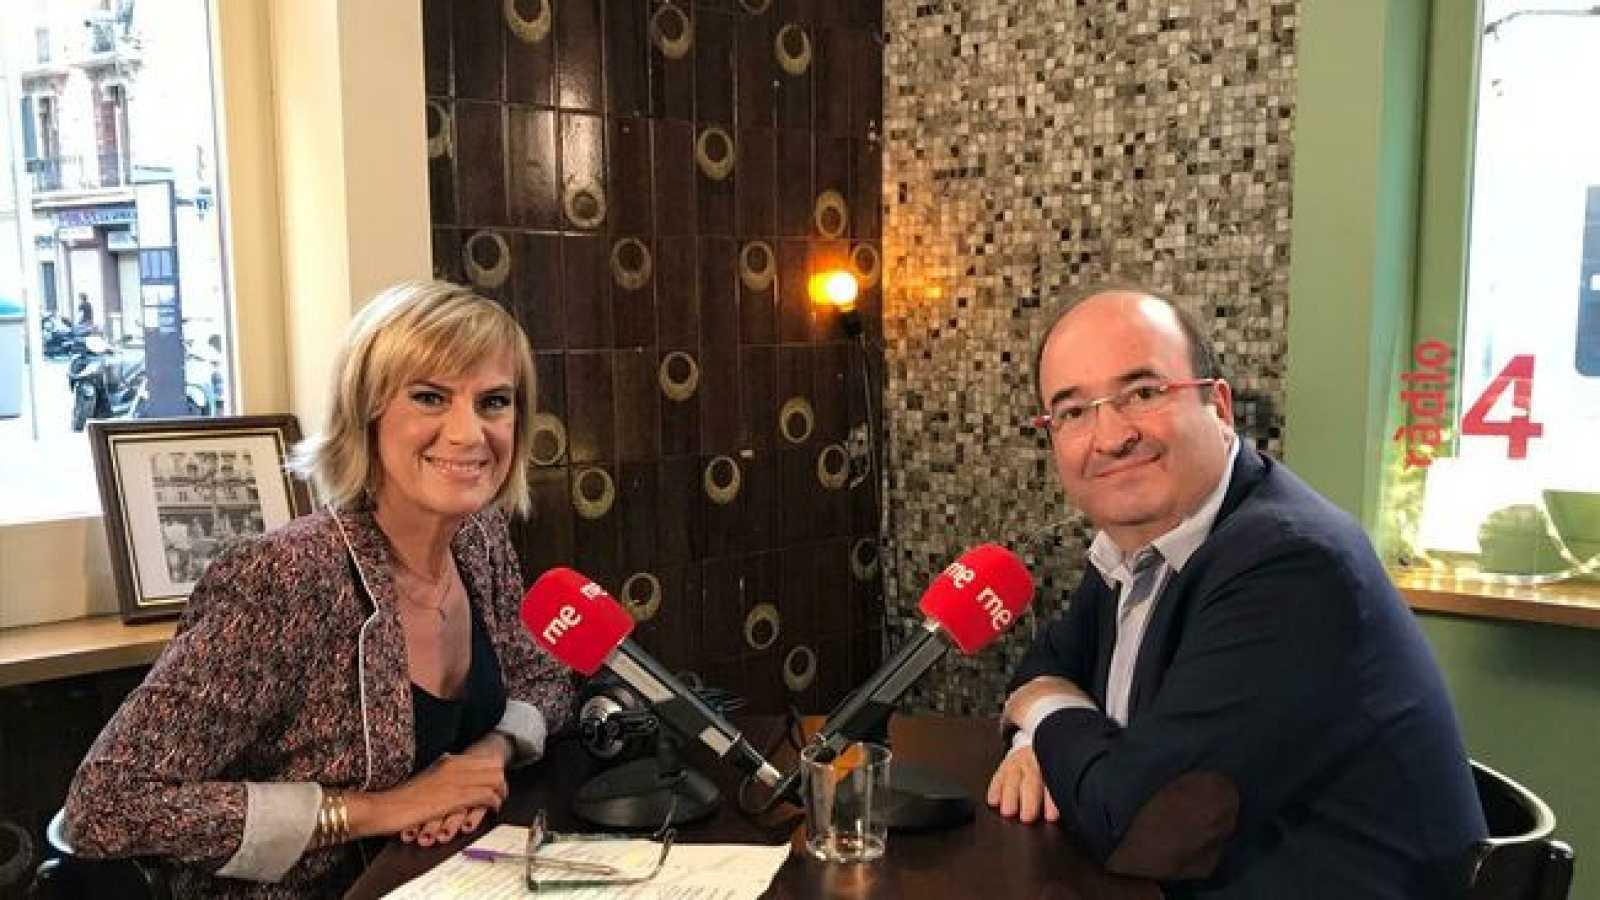 Gemma Nierga entrevista Miquel Iceta 06/04/20